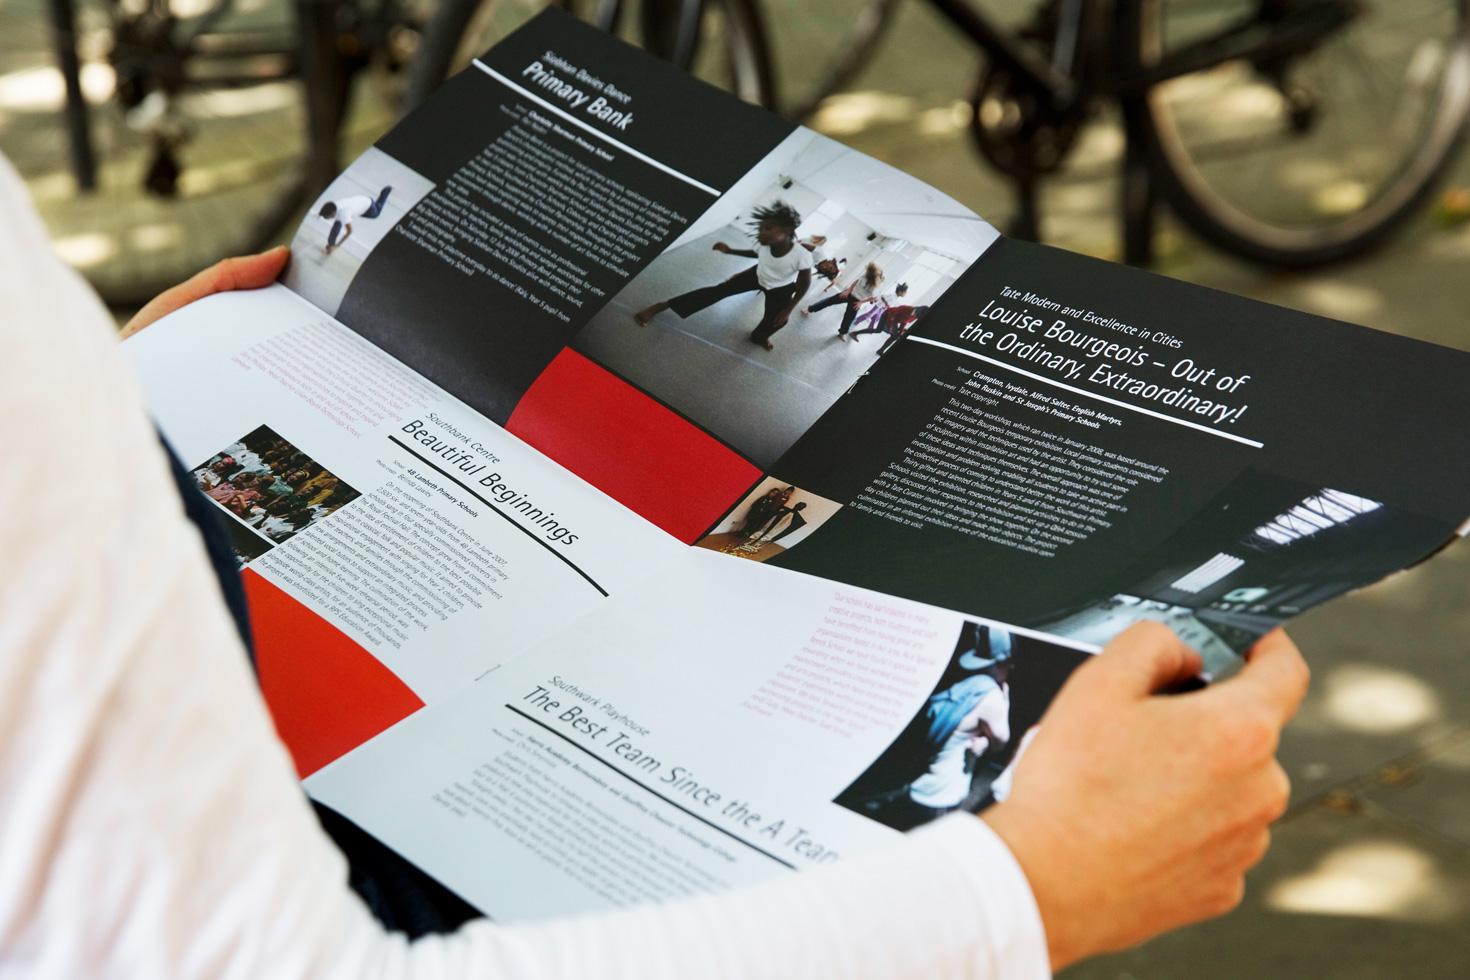 Southbank Centre leaflet